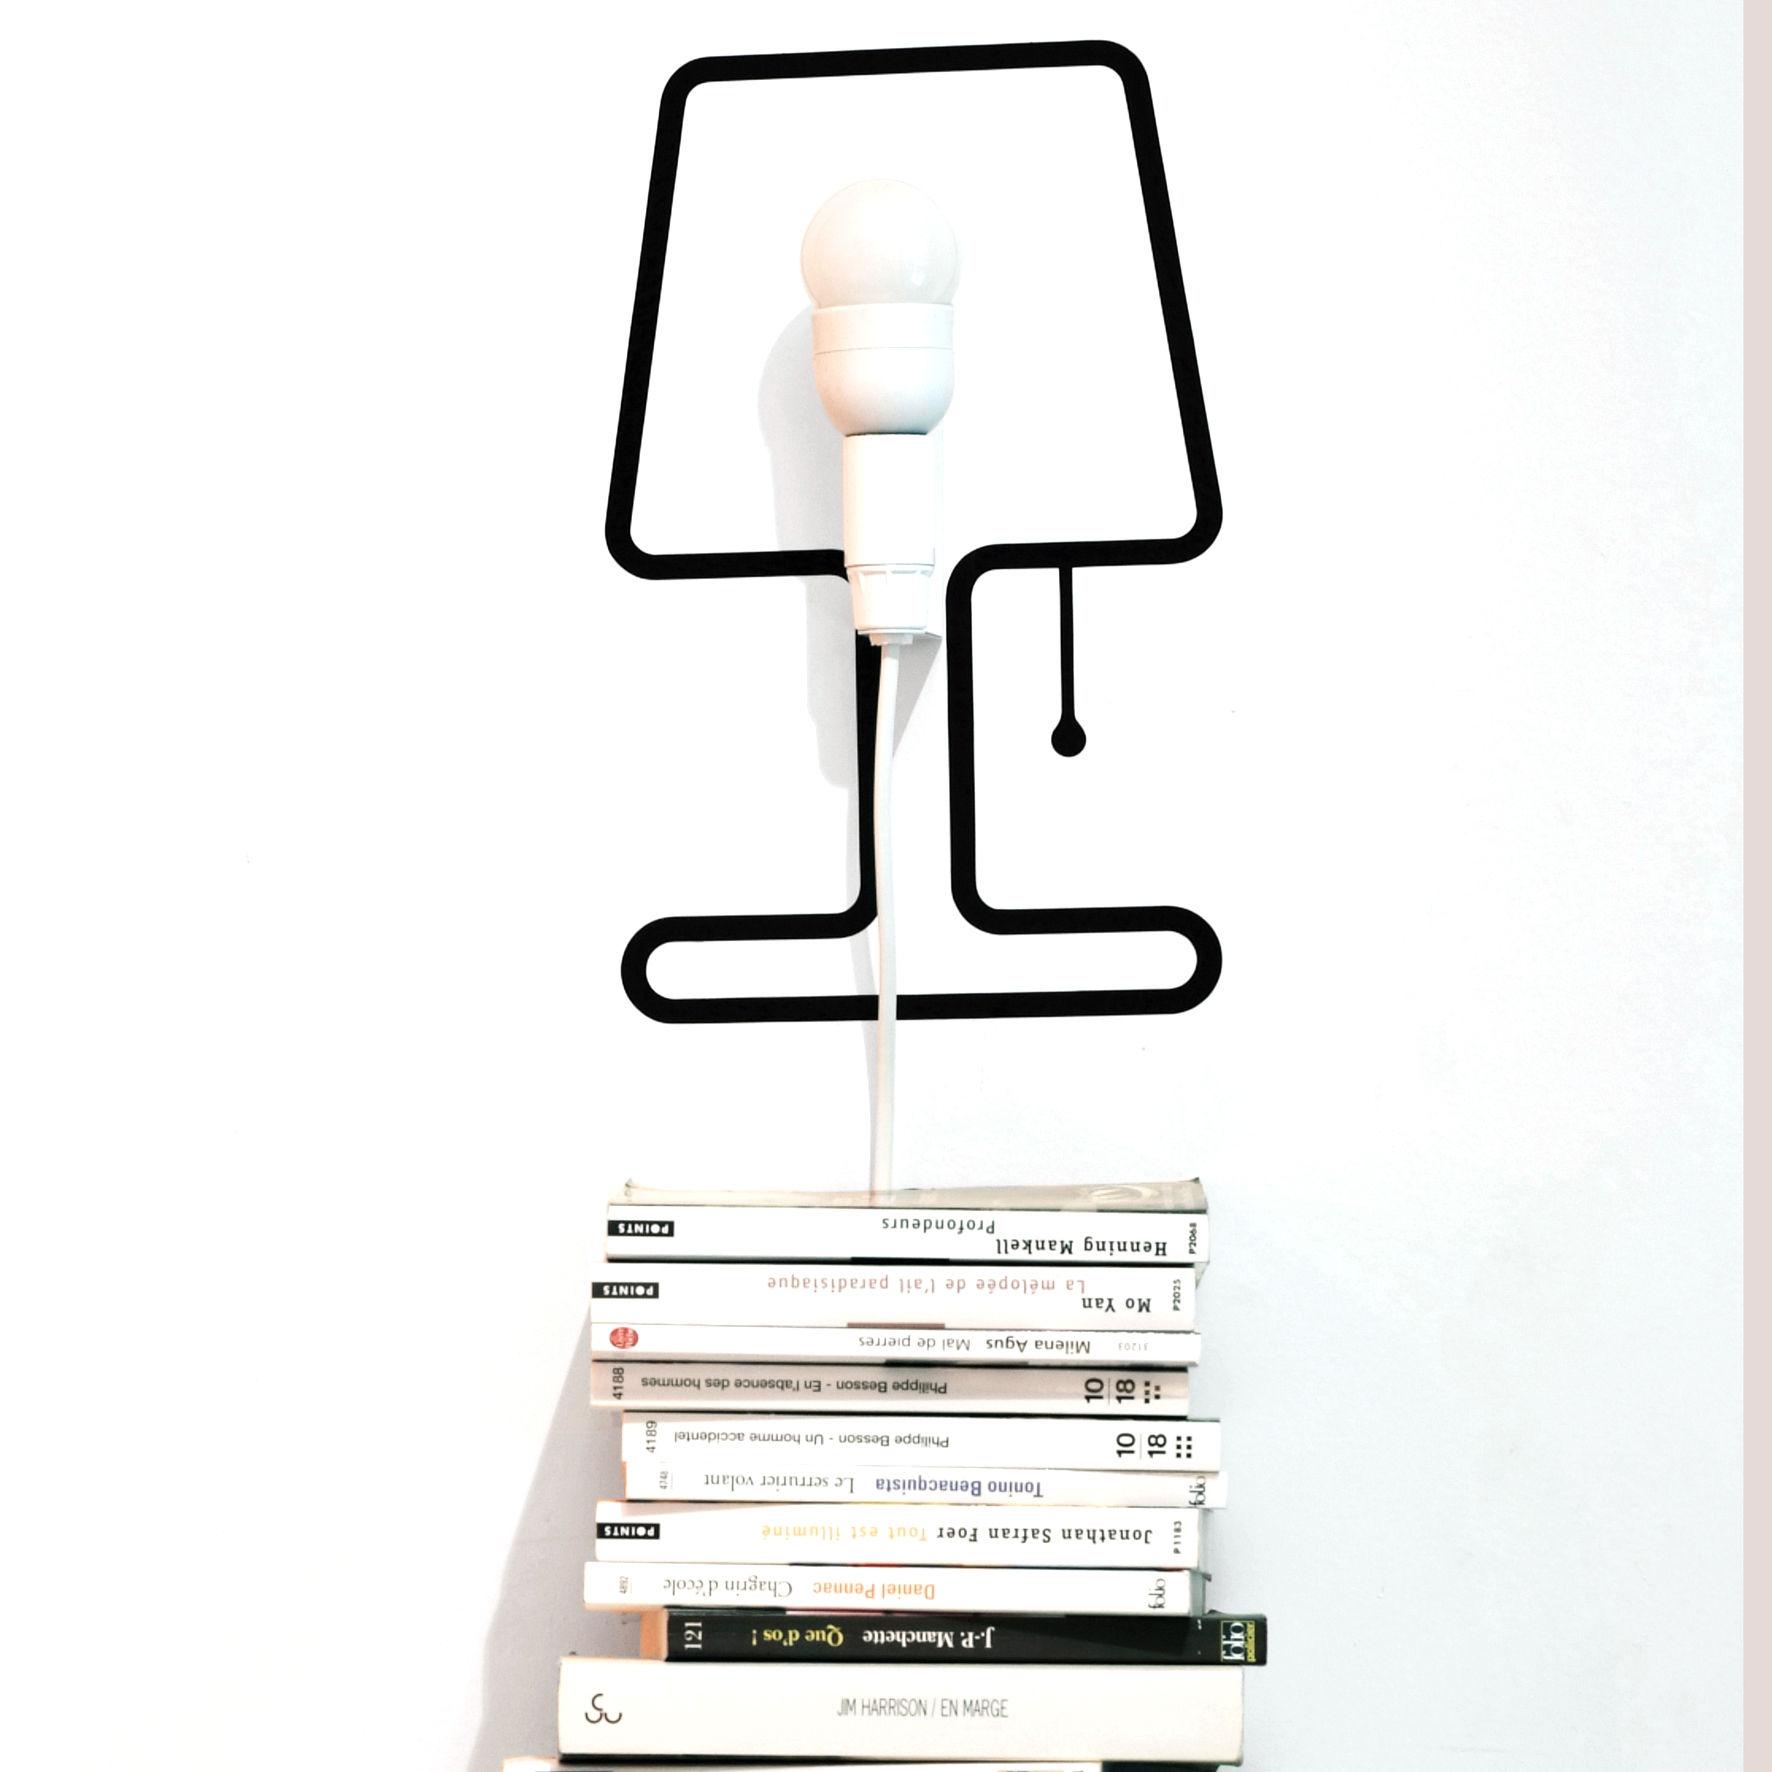 lampe tiny lampe set sticker kit lectrique noir kit. Black Bedroom Furniture Sets. Home Design Ideas